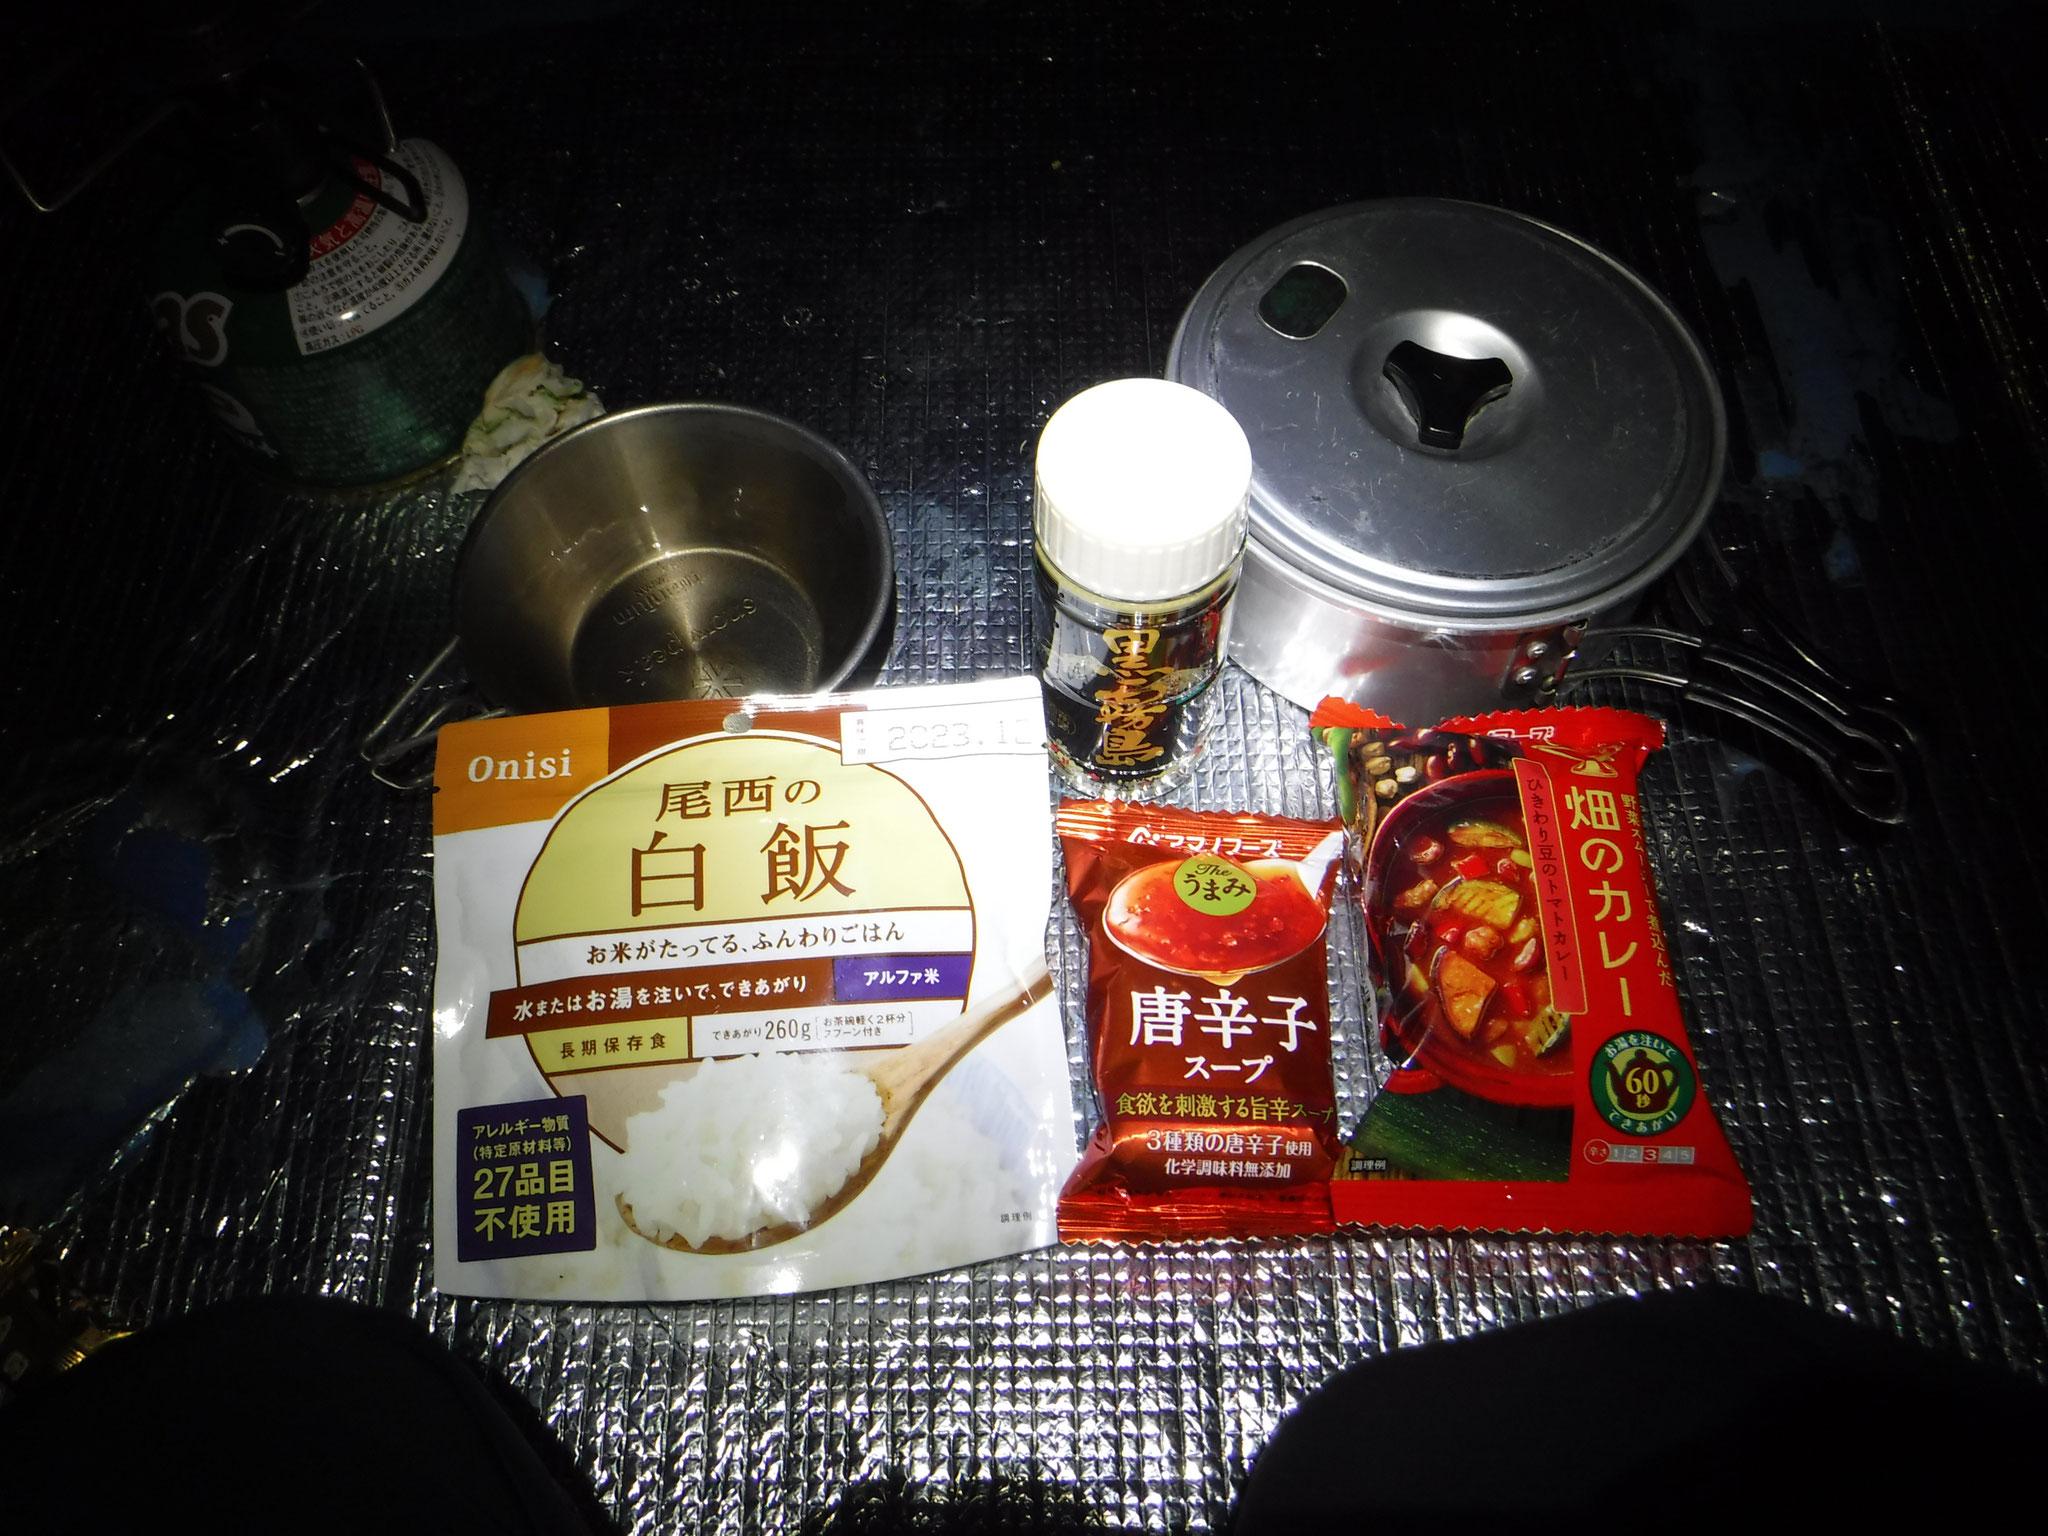 M森夕食、アルファ米、フリーズドライカレー、唐辛子スープ